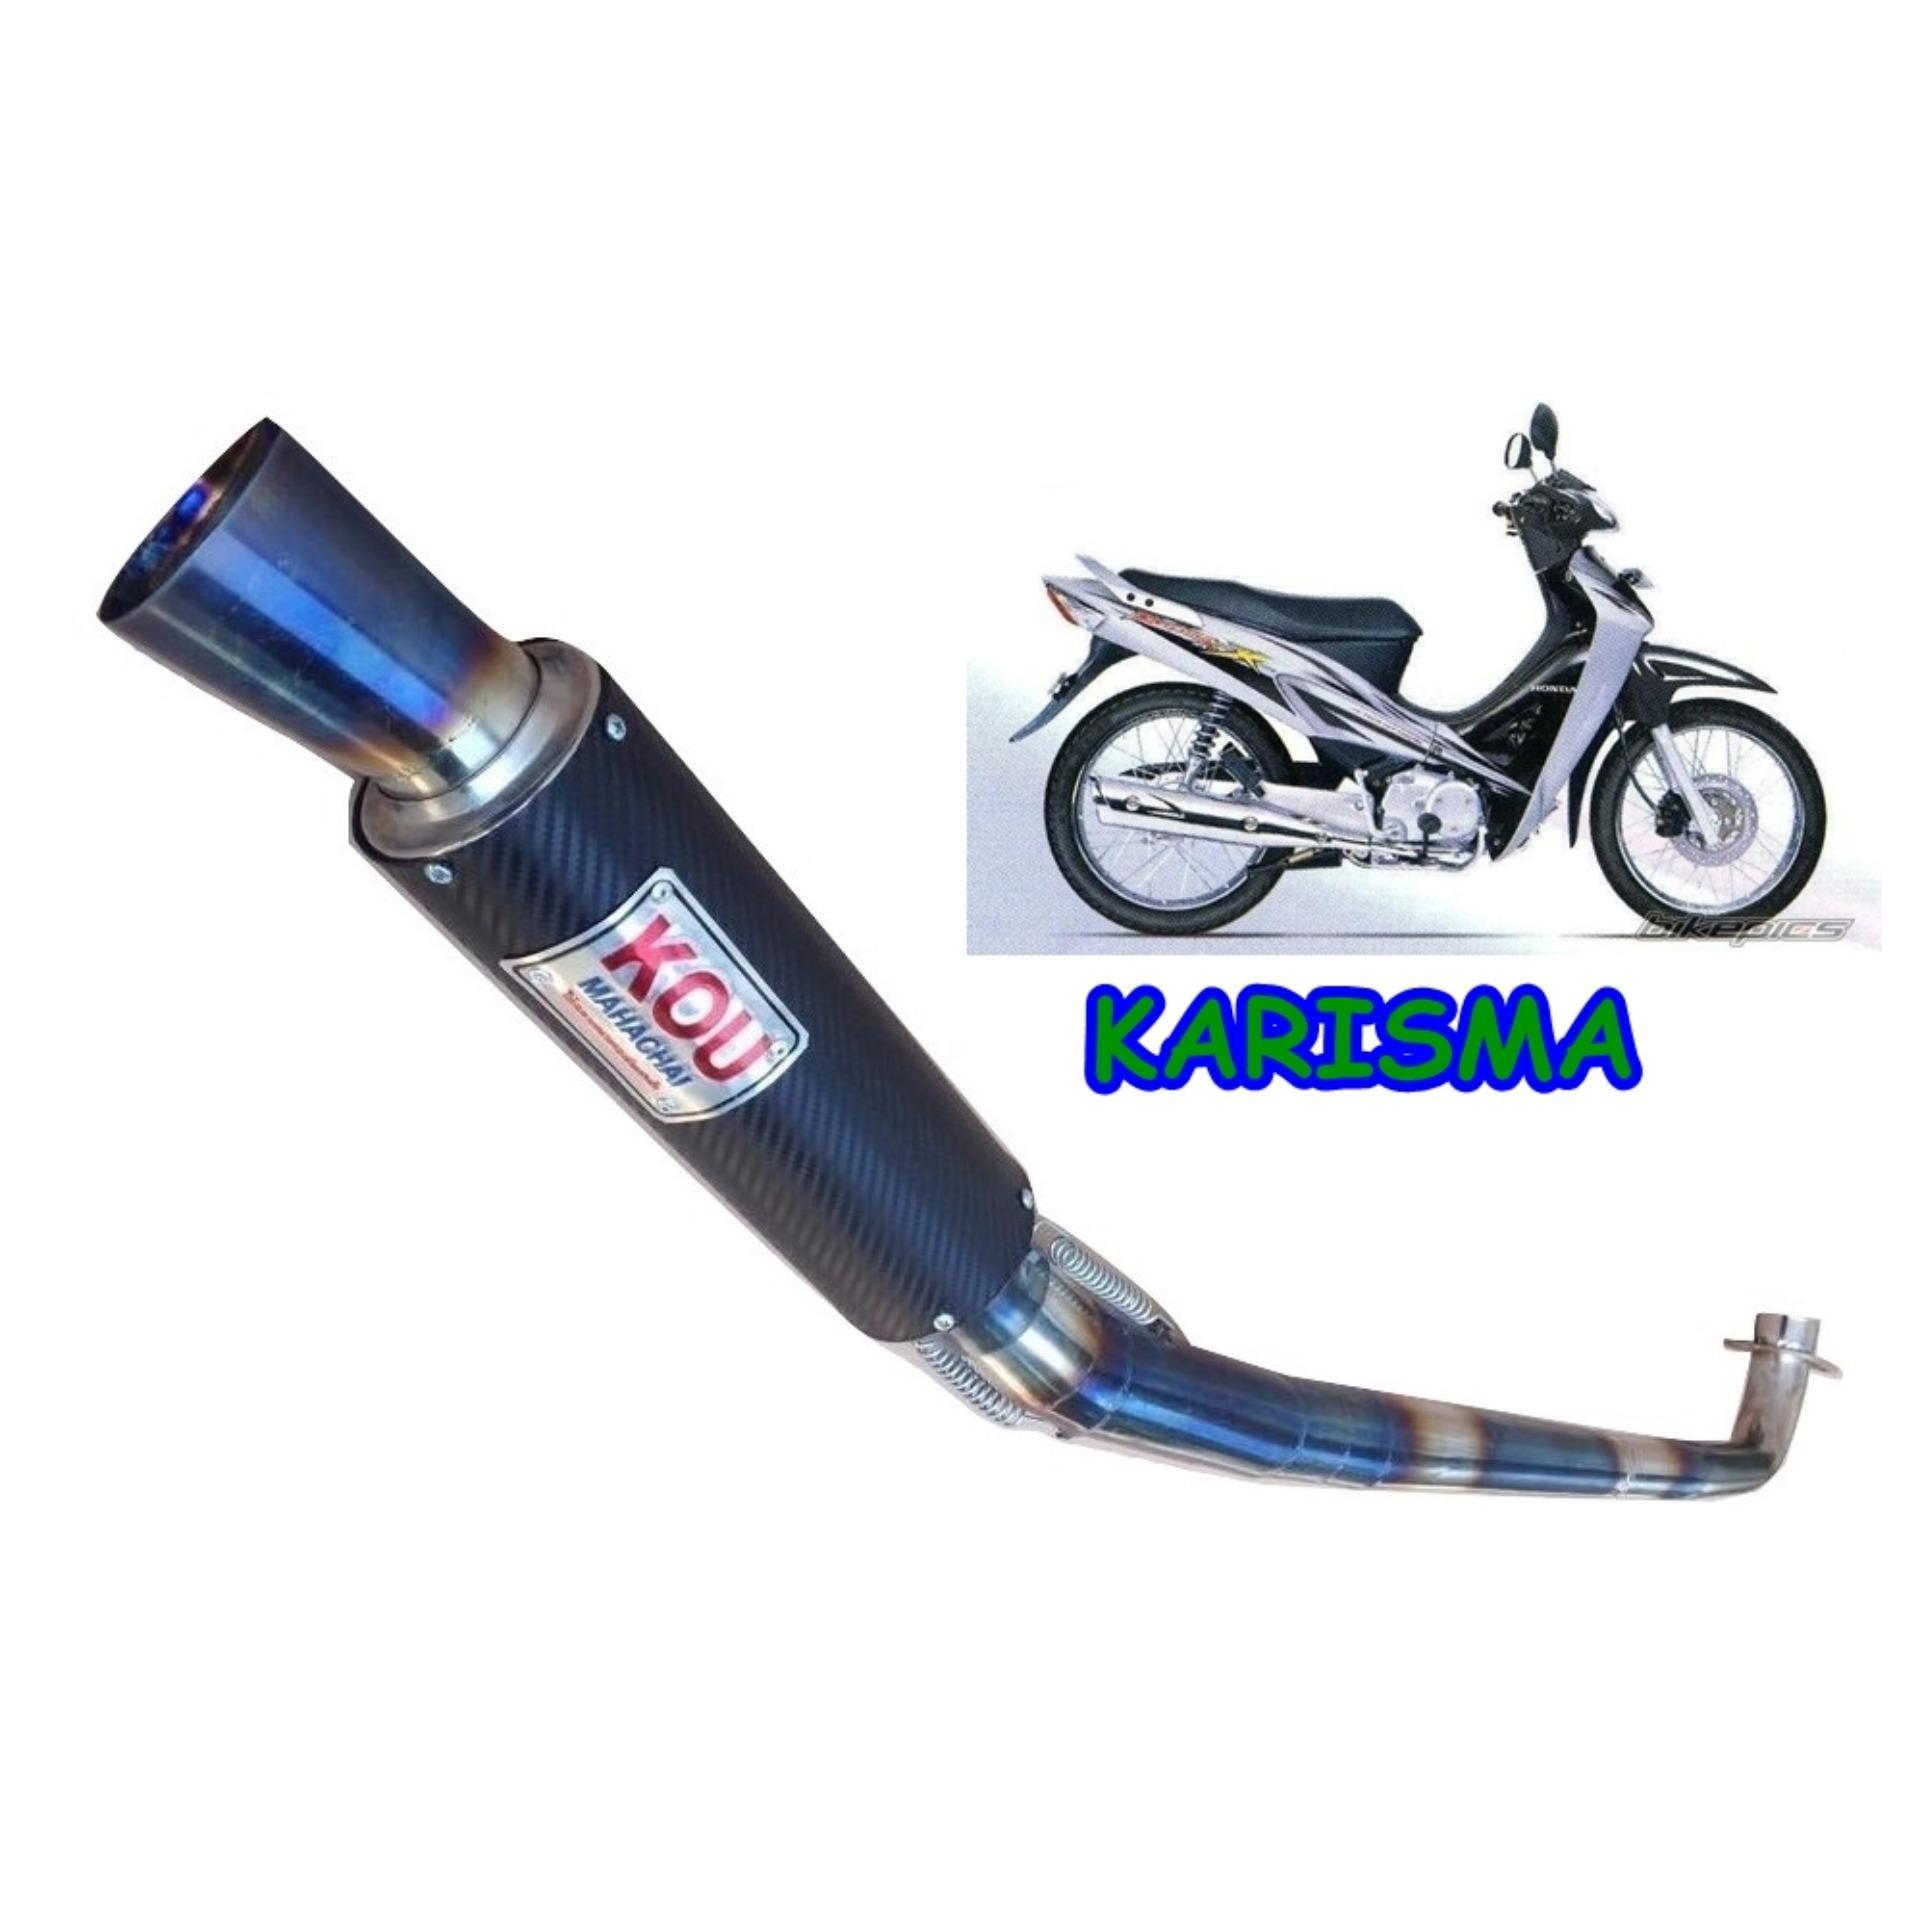 Jual Komponen Knalpot Emisi Kendaraan Lazada Prospeed Byson Yamaha Exhaust Motor Karisma Kou Hitam Karbon Bluemoon